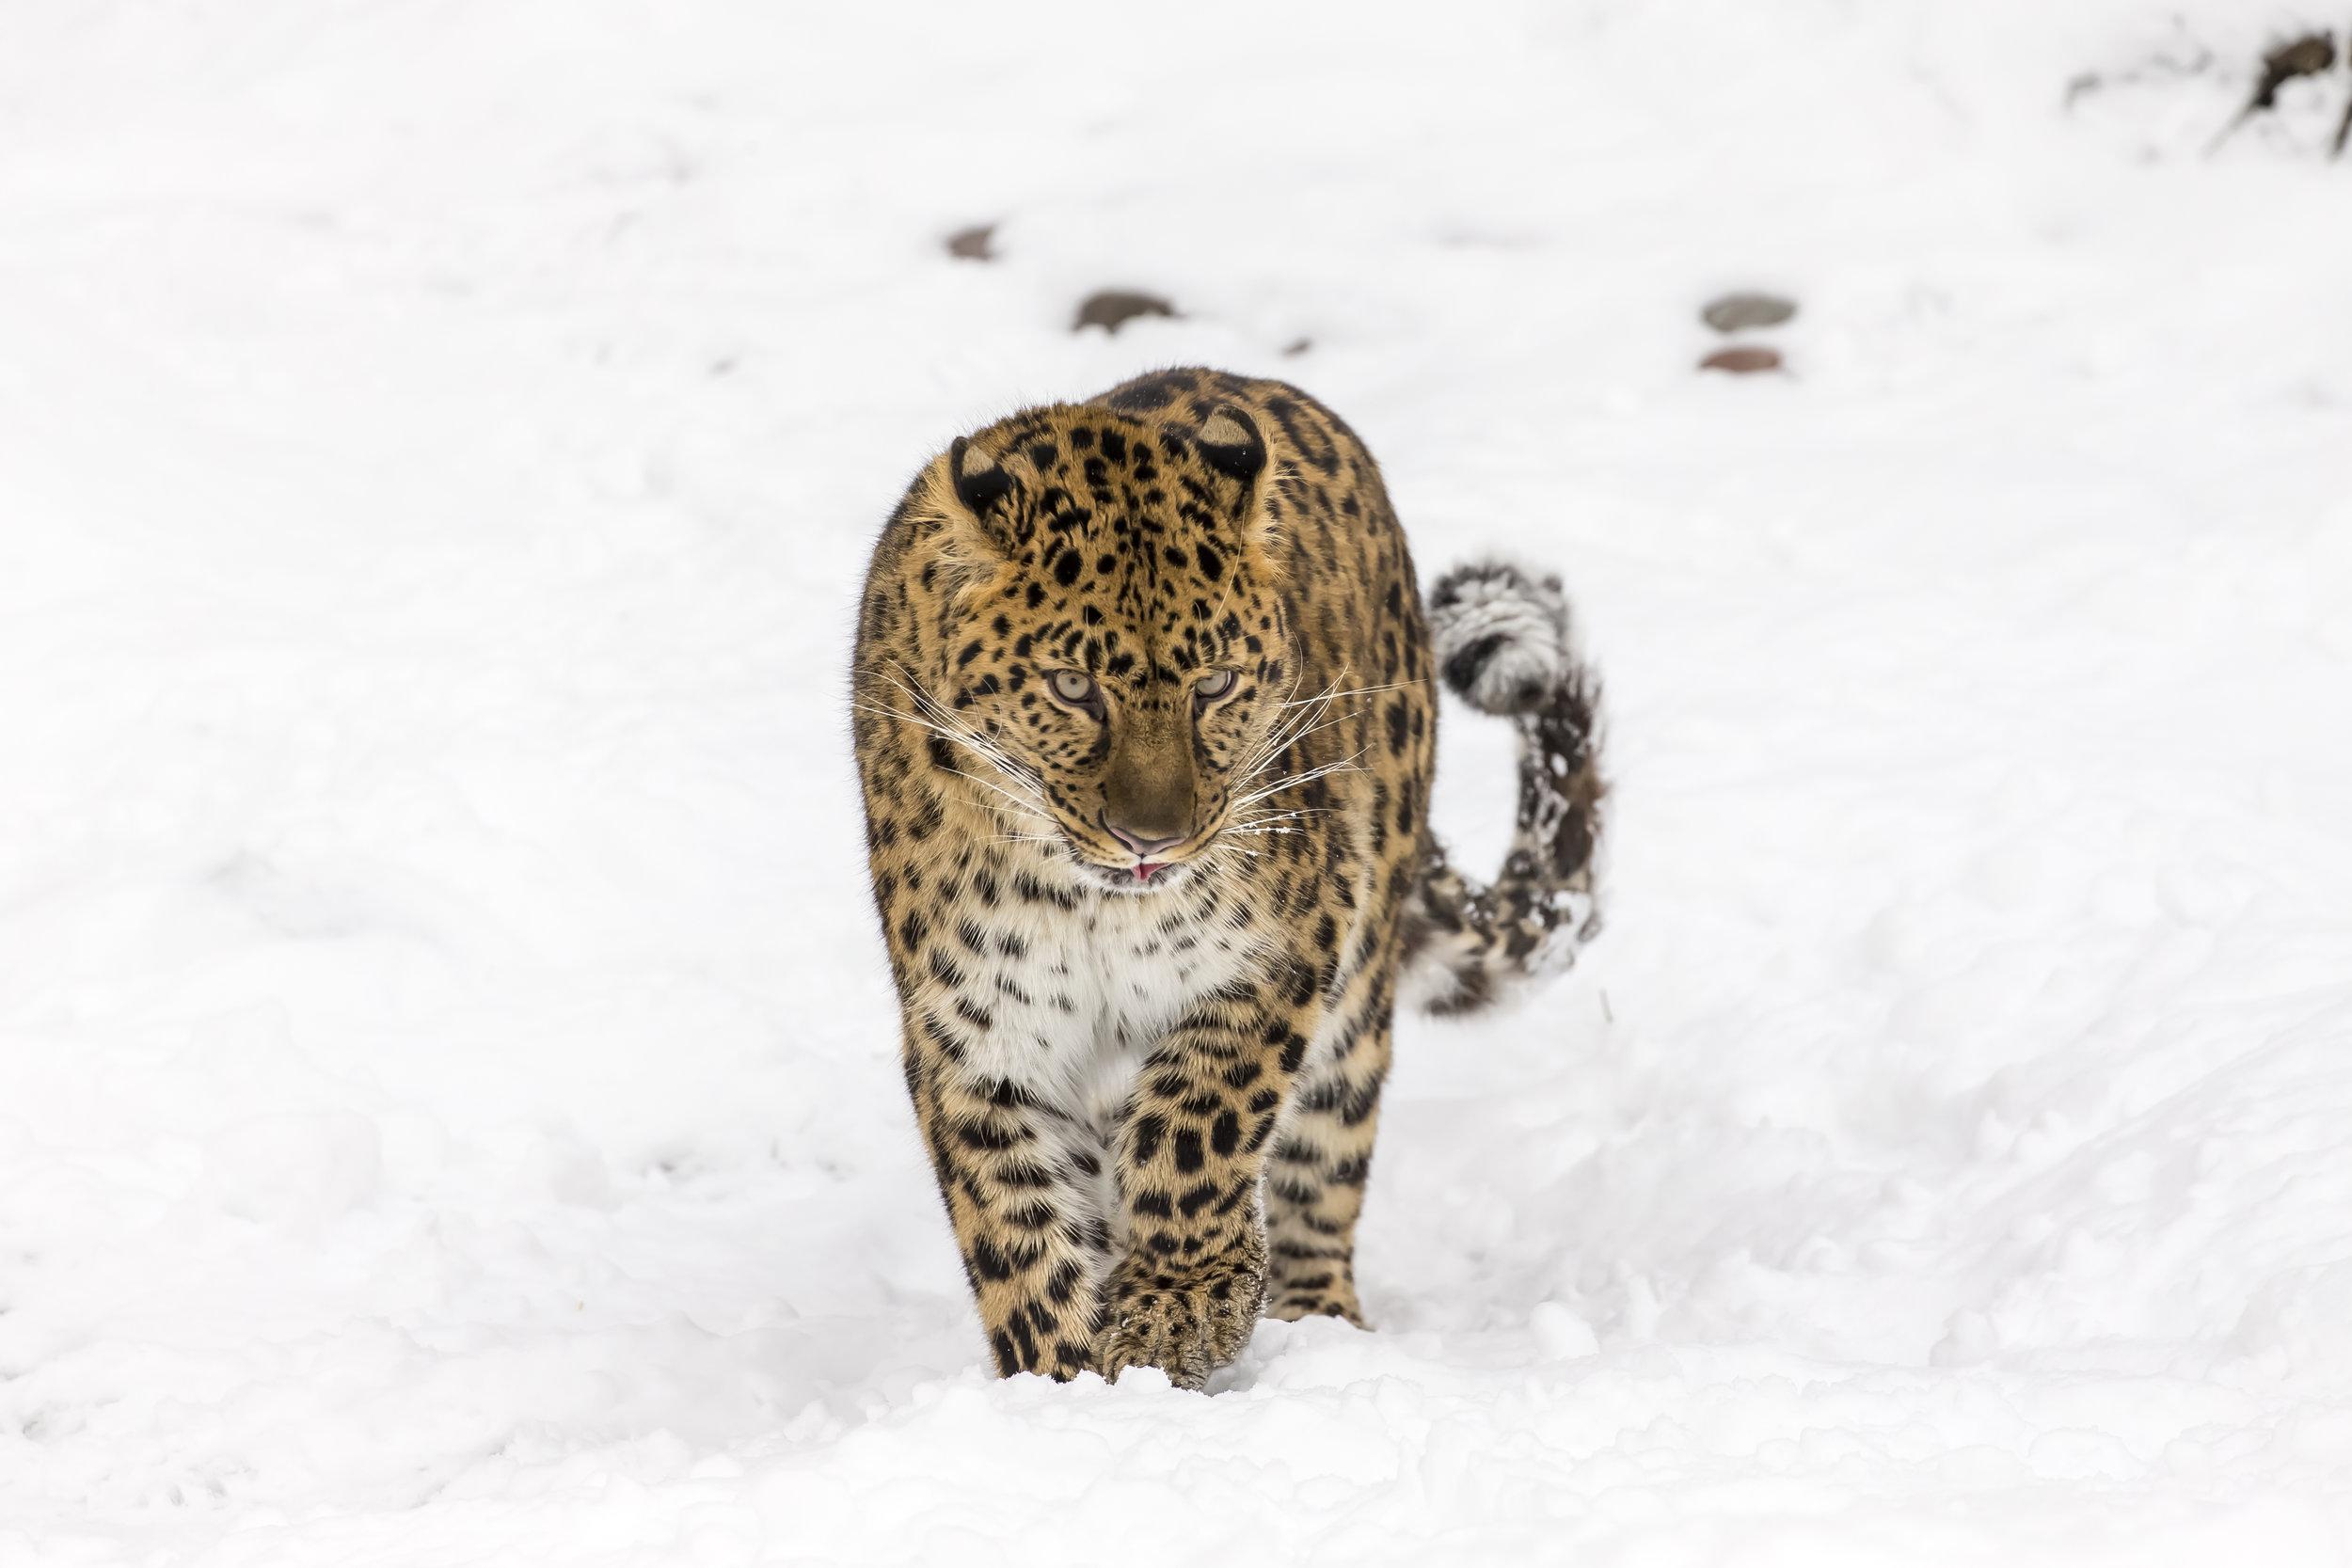 (Image Shutterstock)